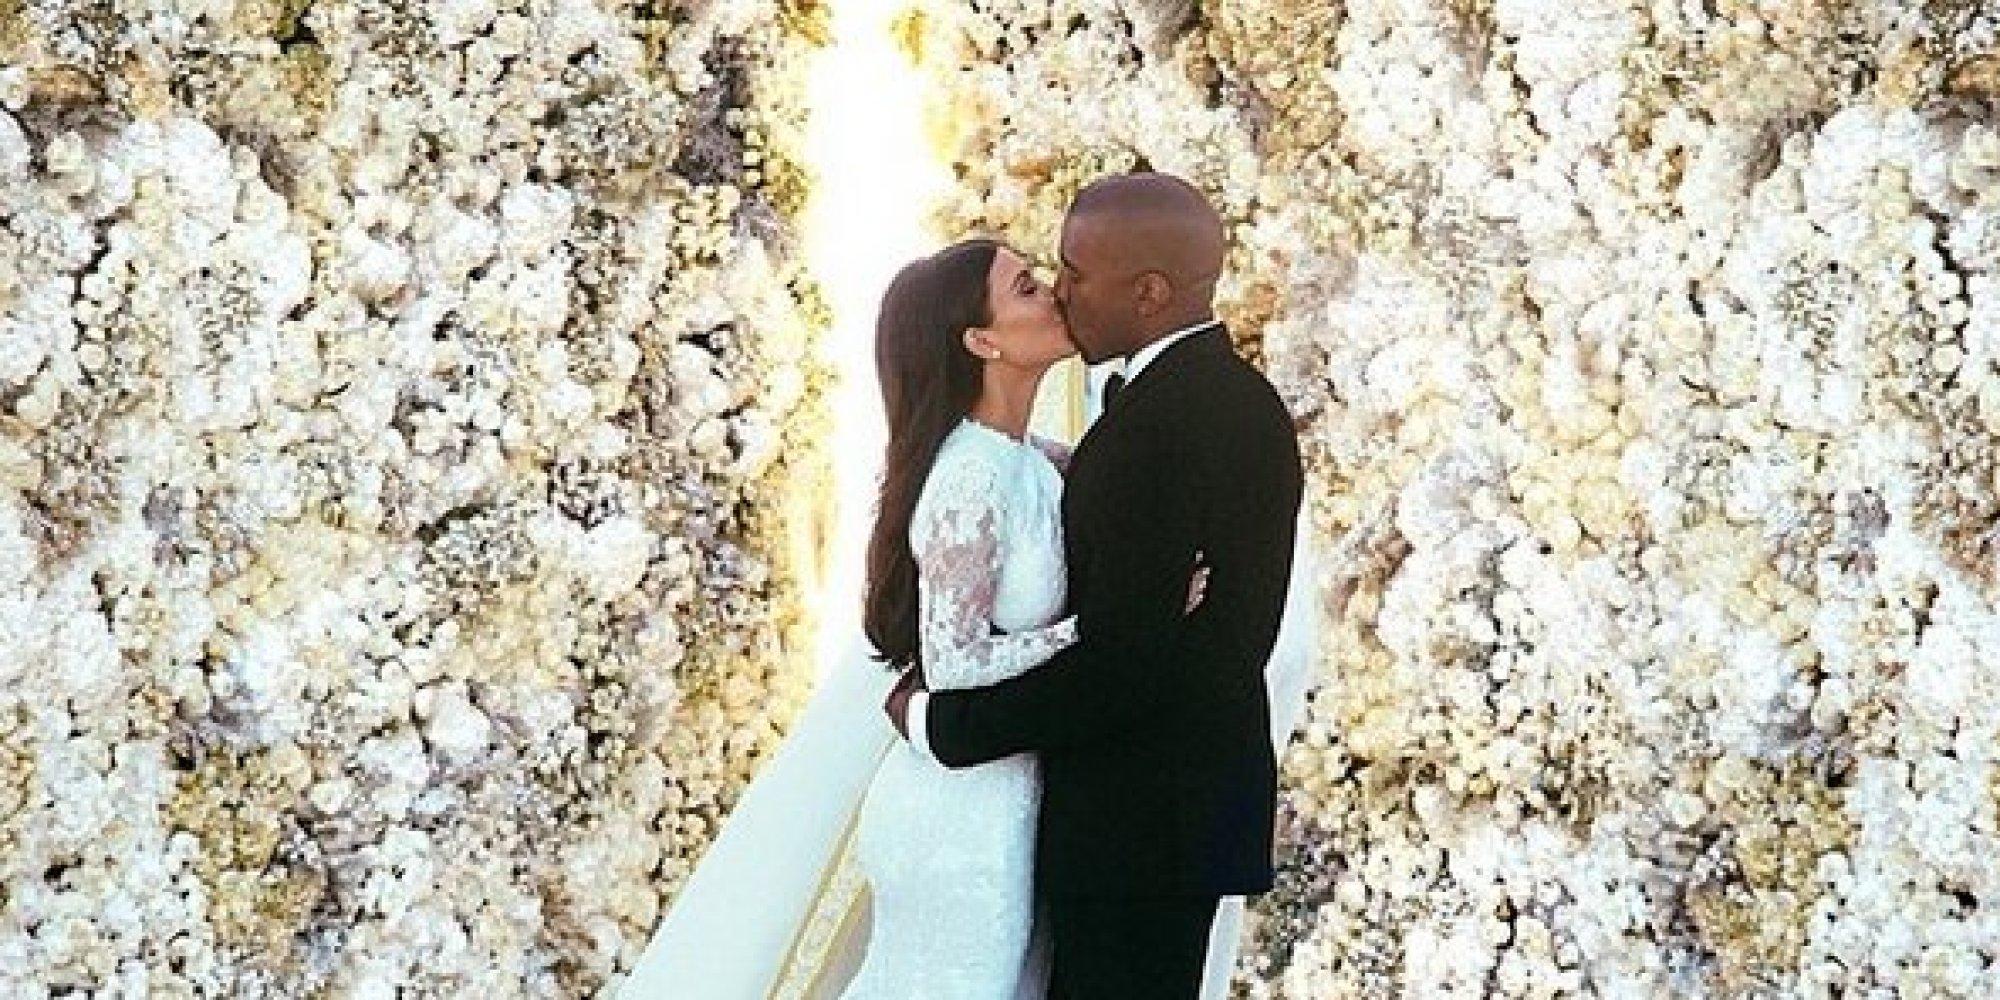 Kimye Wedding Photo Sets Instagram Record For Most Likes